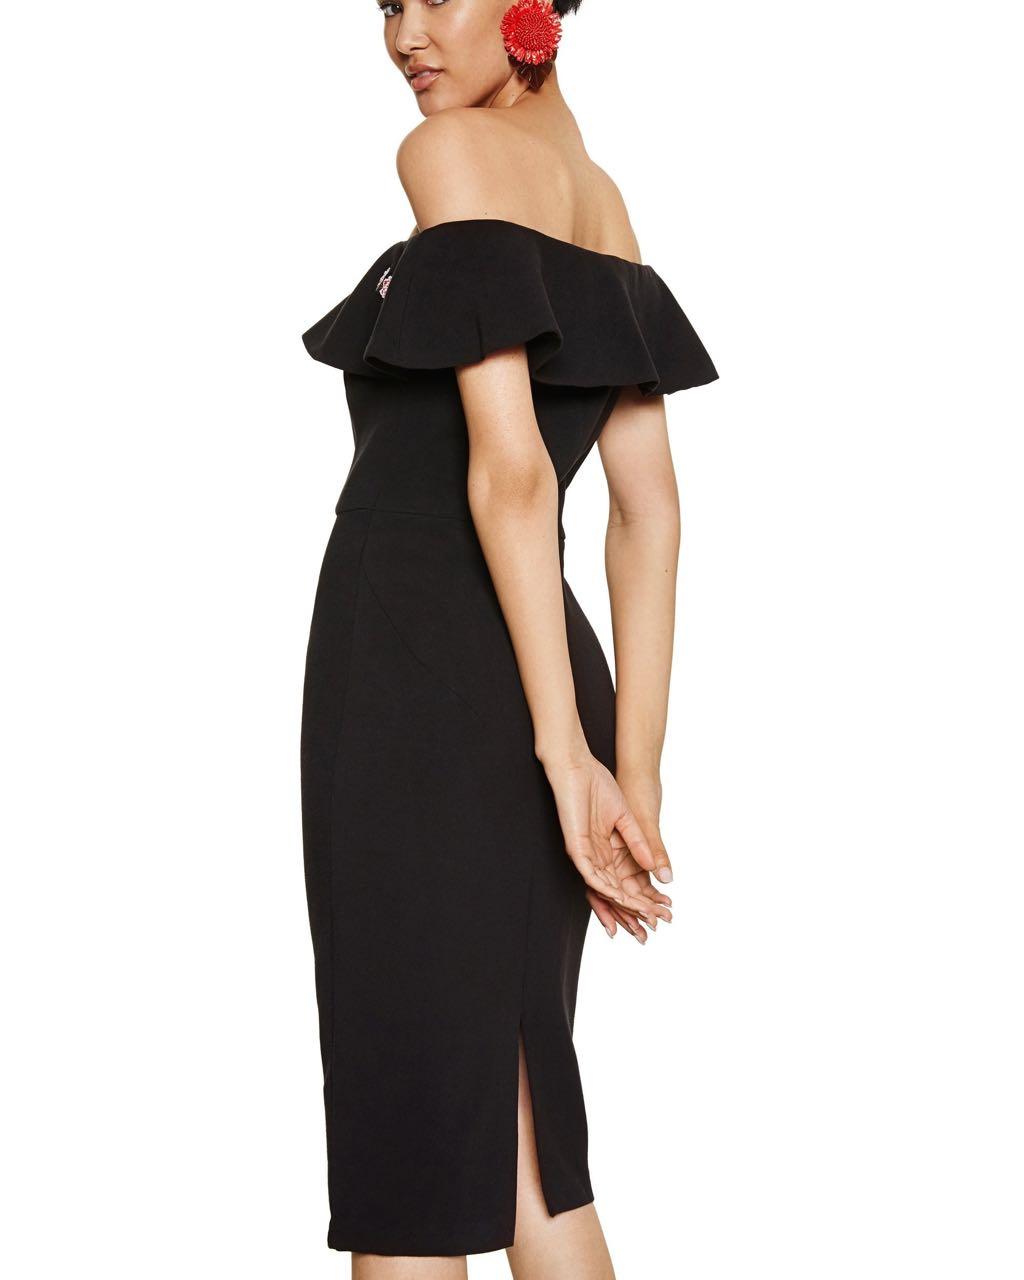 Desigual Dress Marina 18swvwaw Black Ruffled Neckline Buy Online